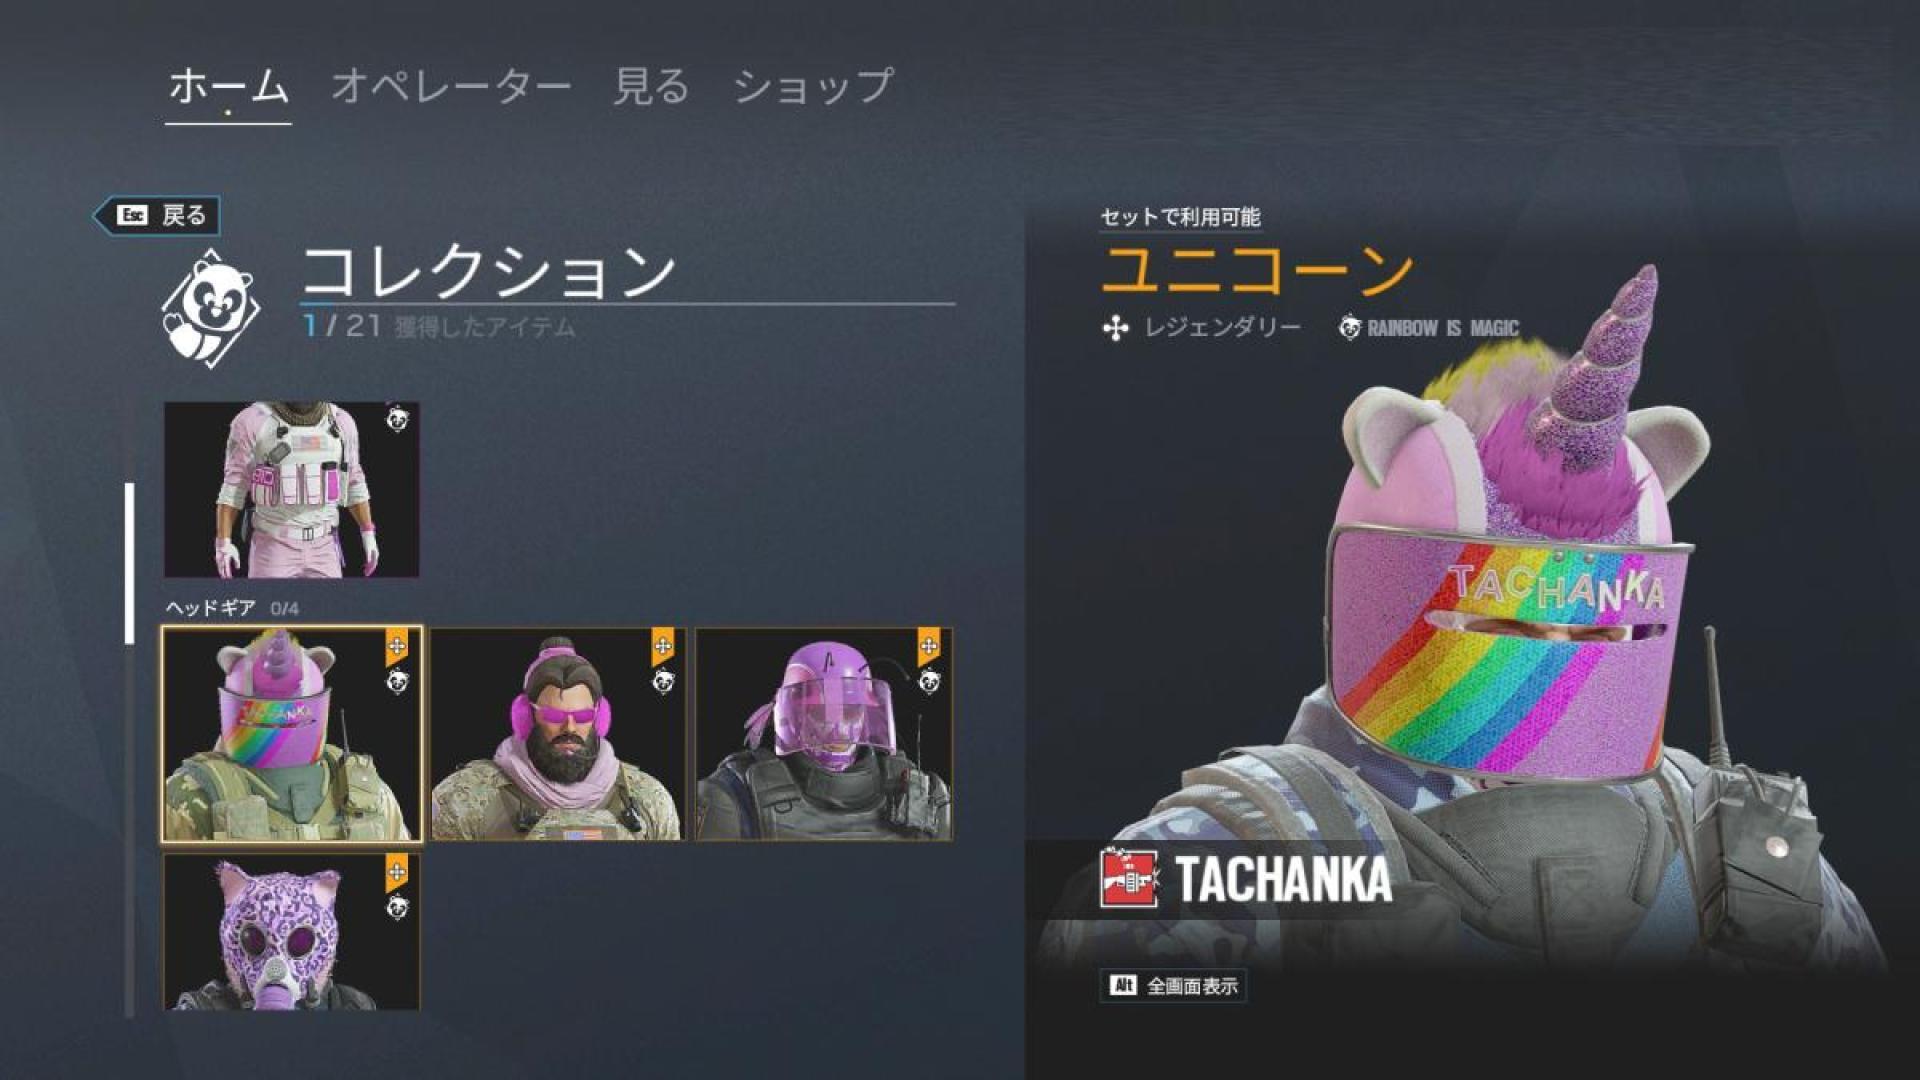 rainbowismagic